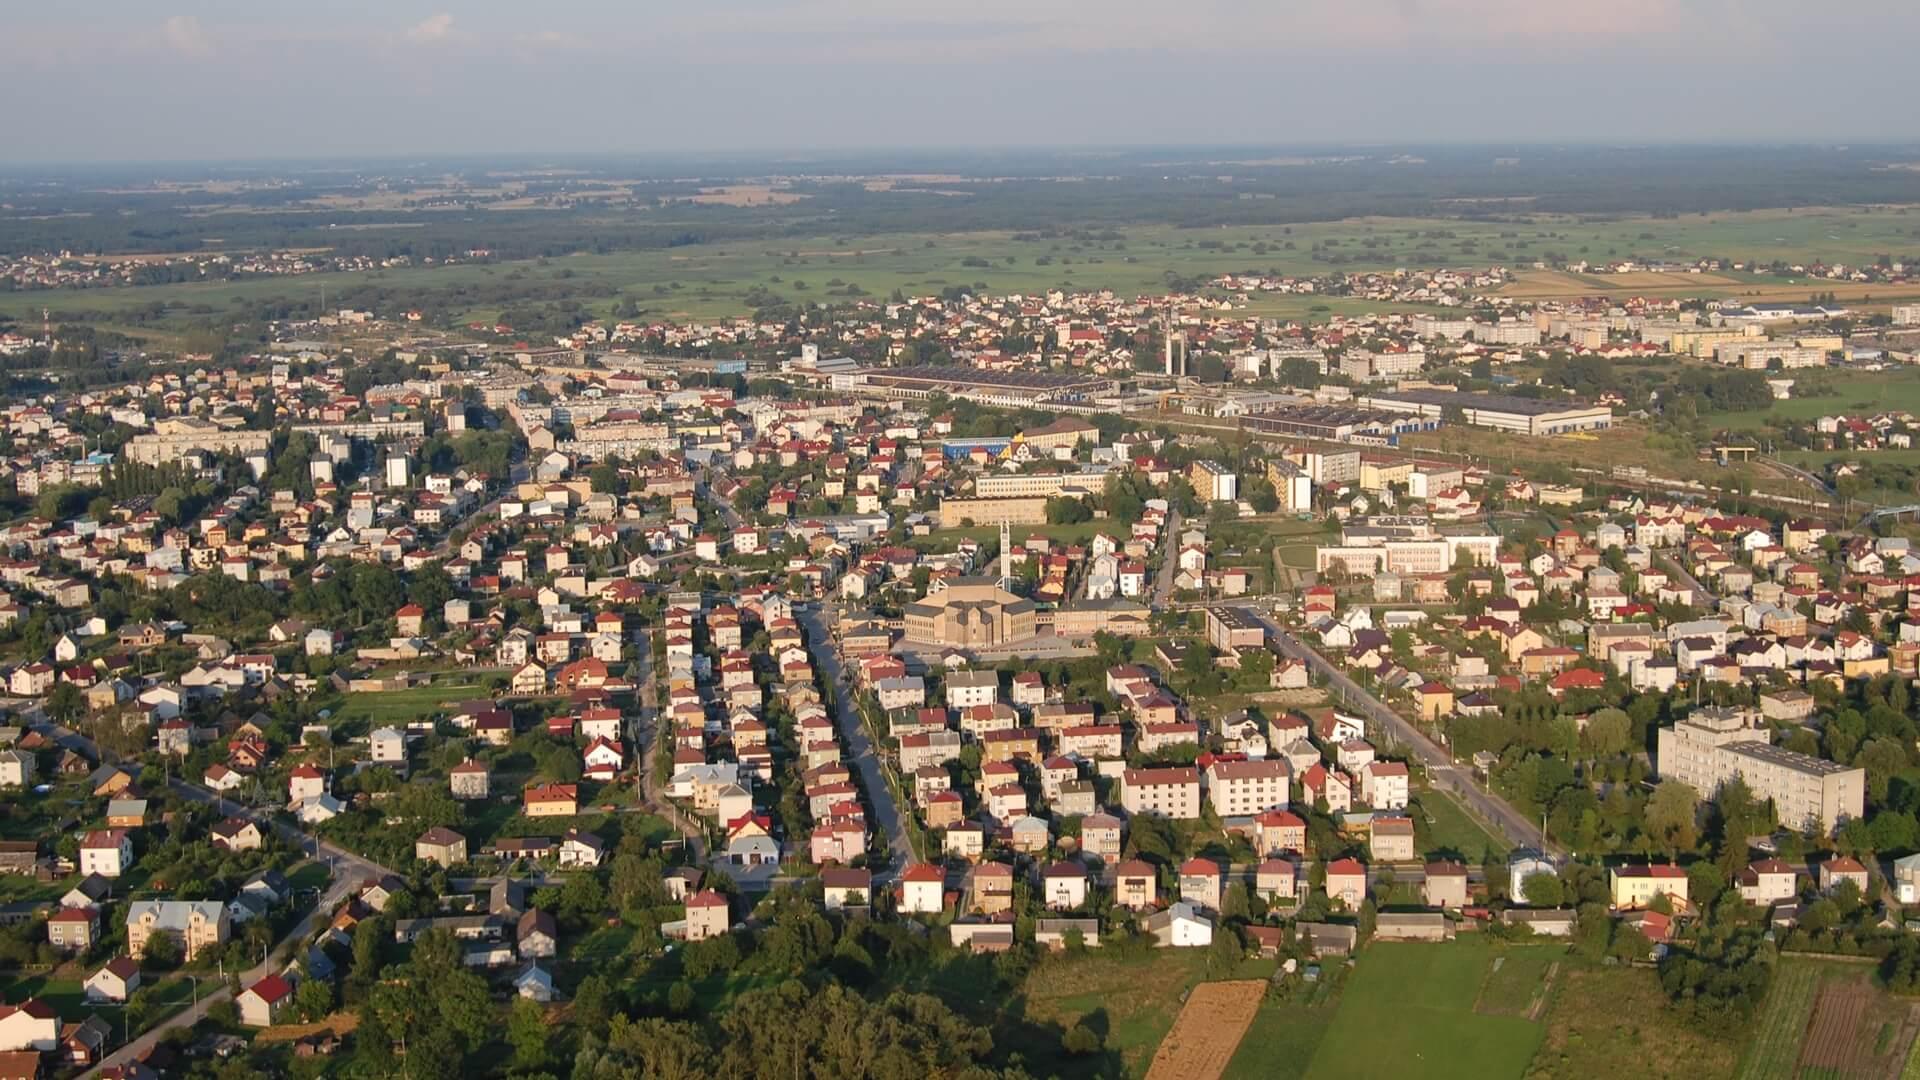 Łapy, fot. M.Górski